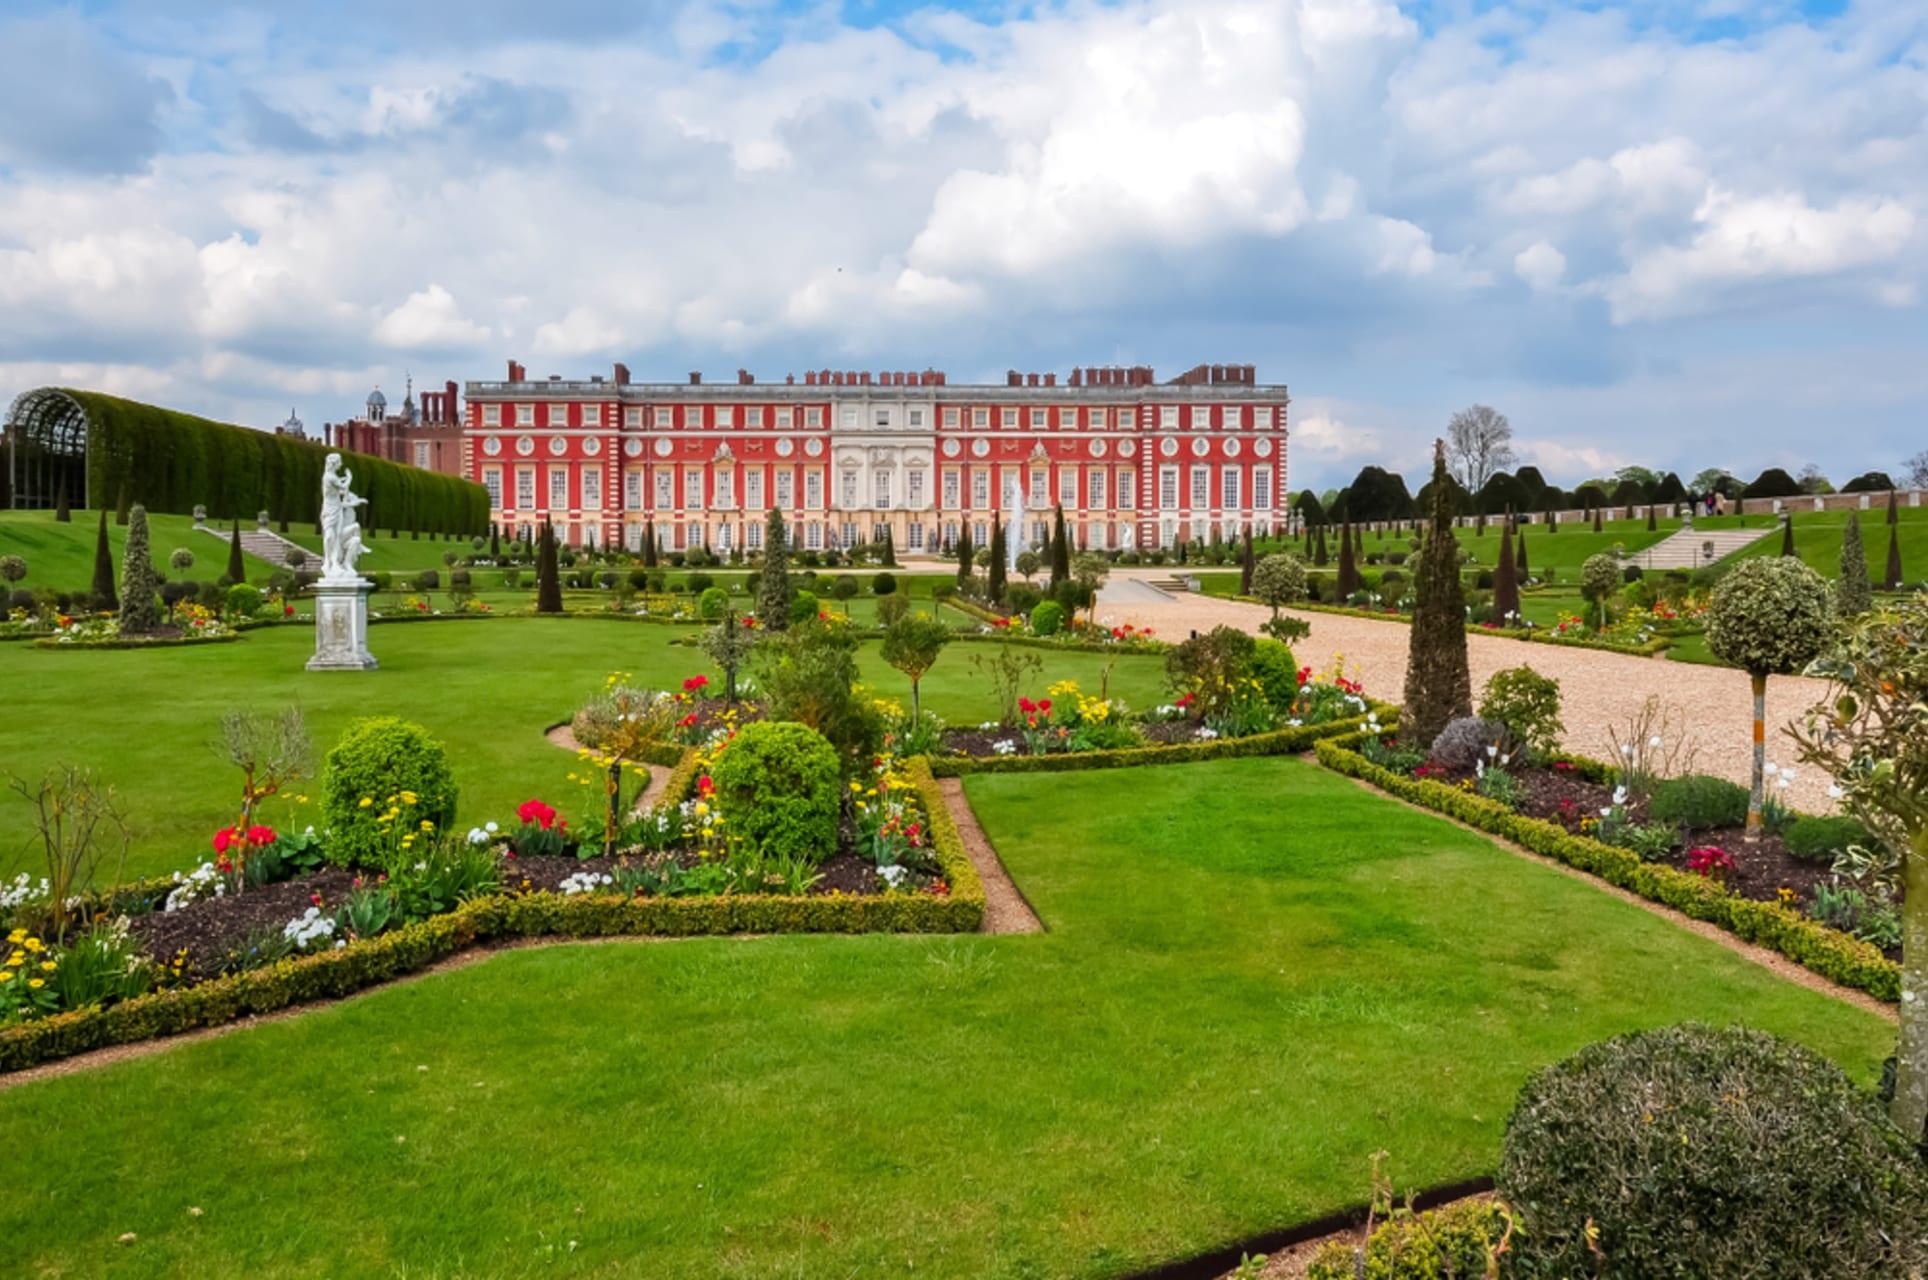 London - A stroll through the gardens of Hampton Court Palace